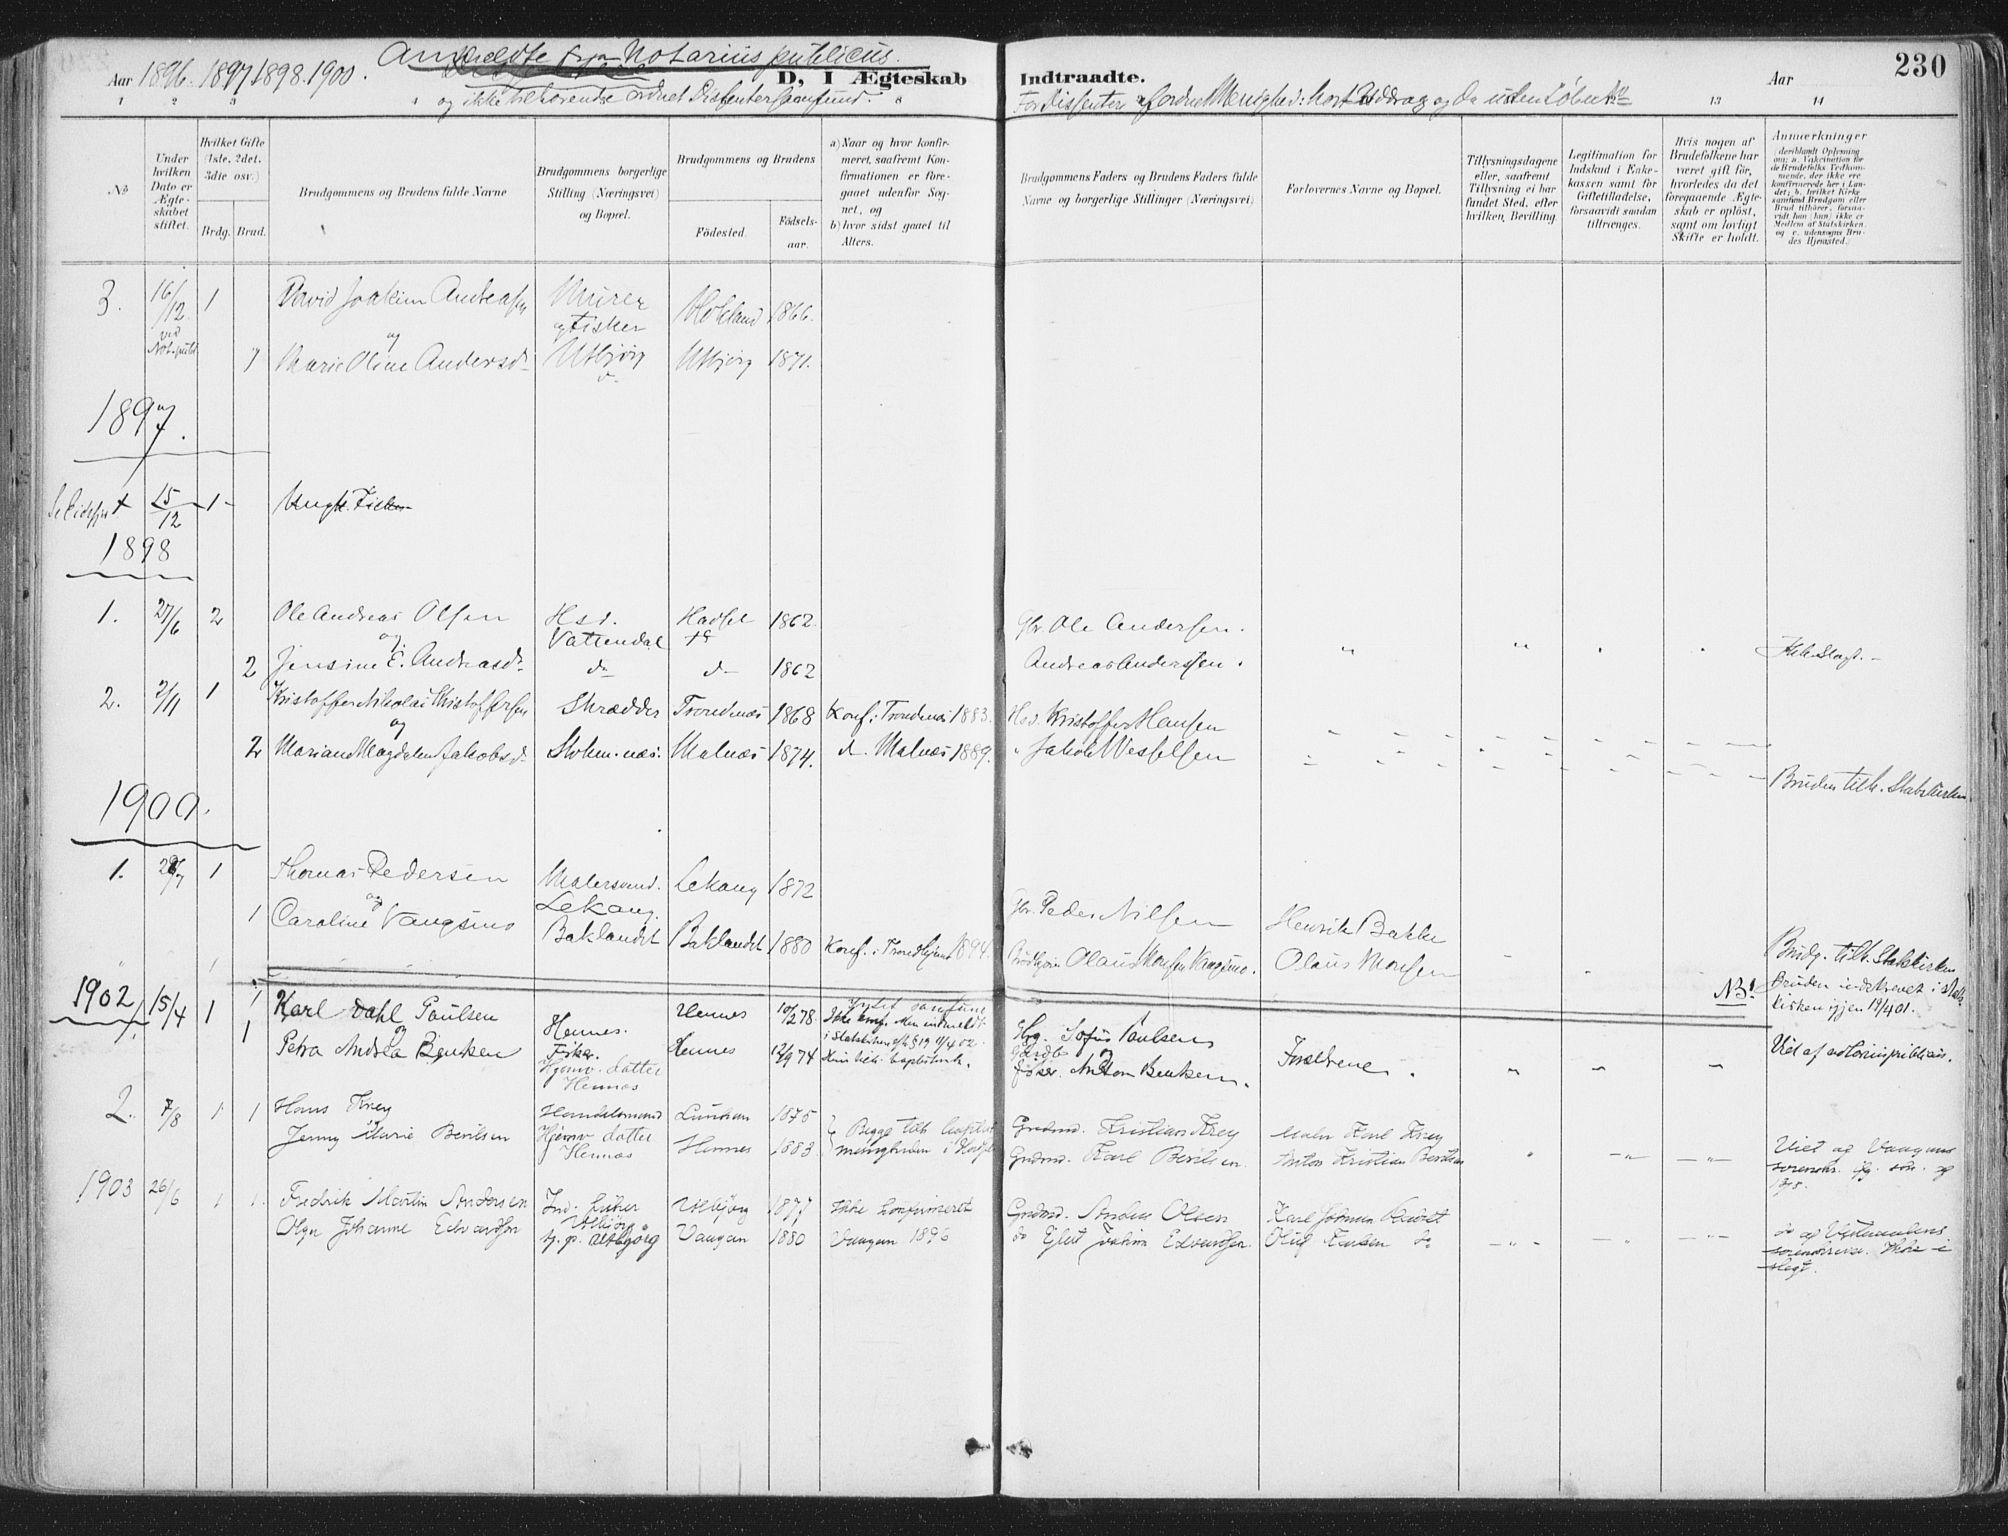 SAT, Ministerialprotokoller, klokkerbøker og fødselsregistre - Nordland, 888/L1246: Ministerialbok nr. 888A12, 1891-1903, s. 230